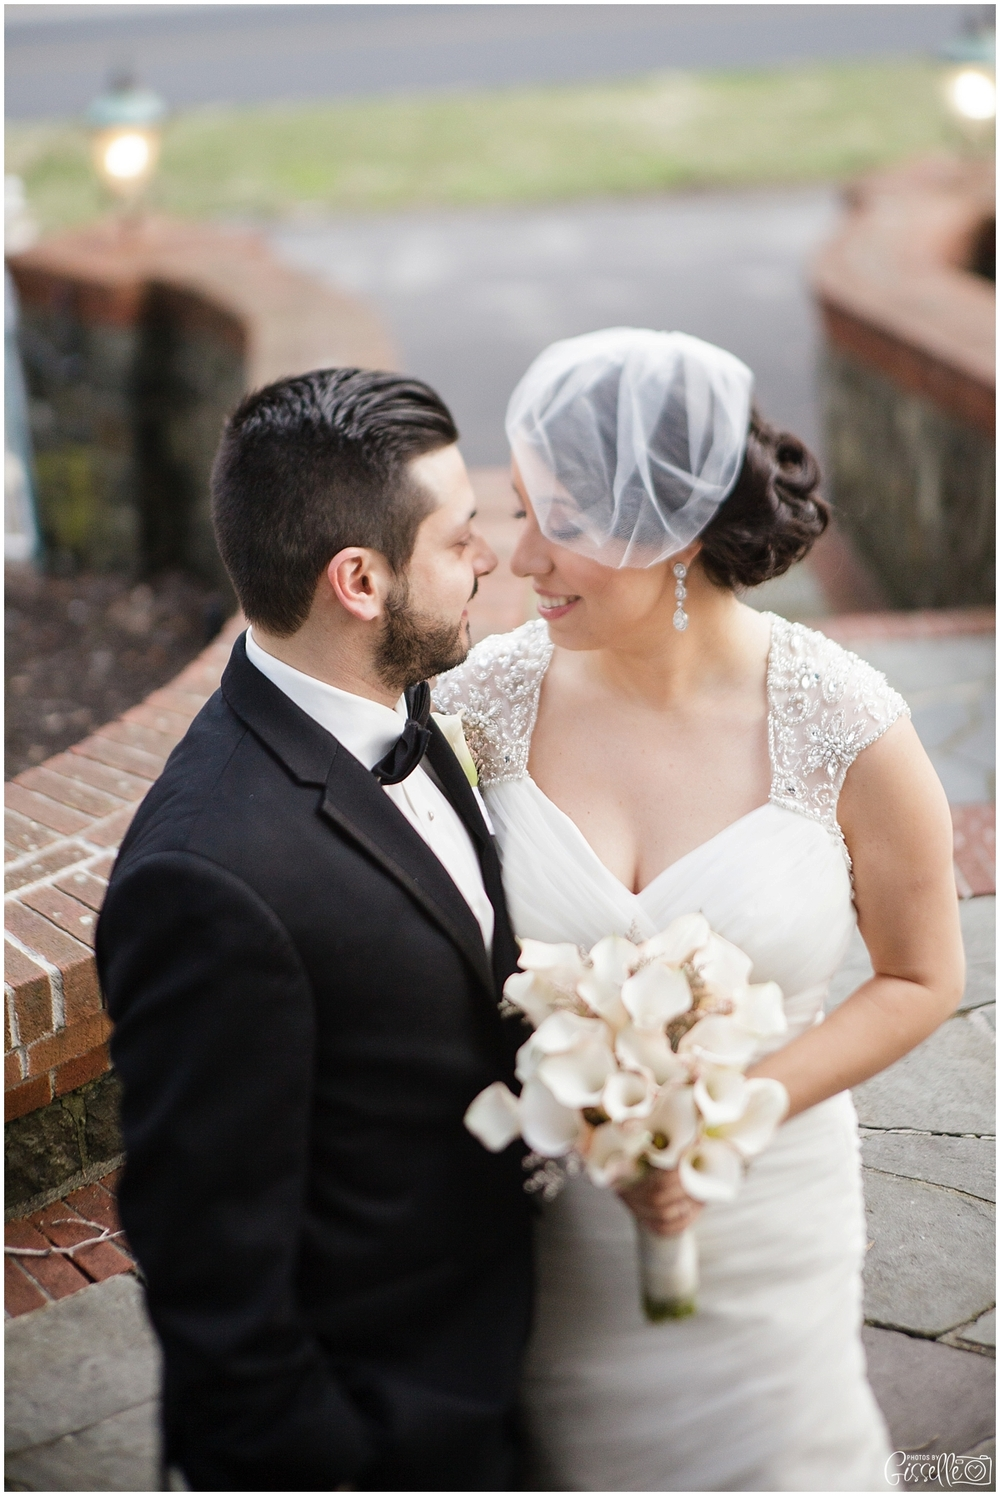 Middletown_NY_Wedding_Photographer_0027.jpg